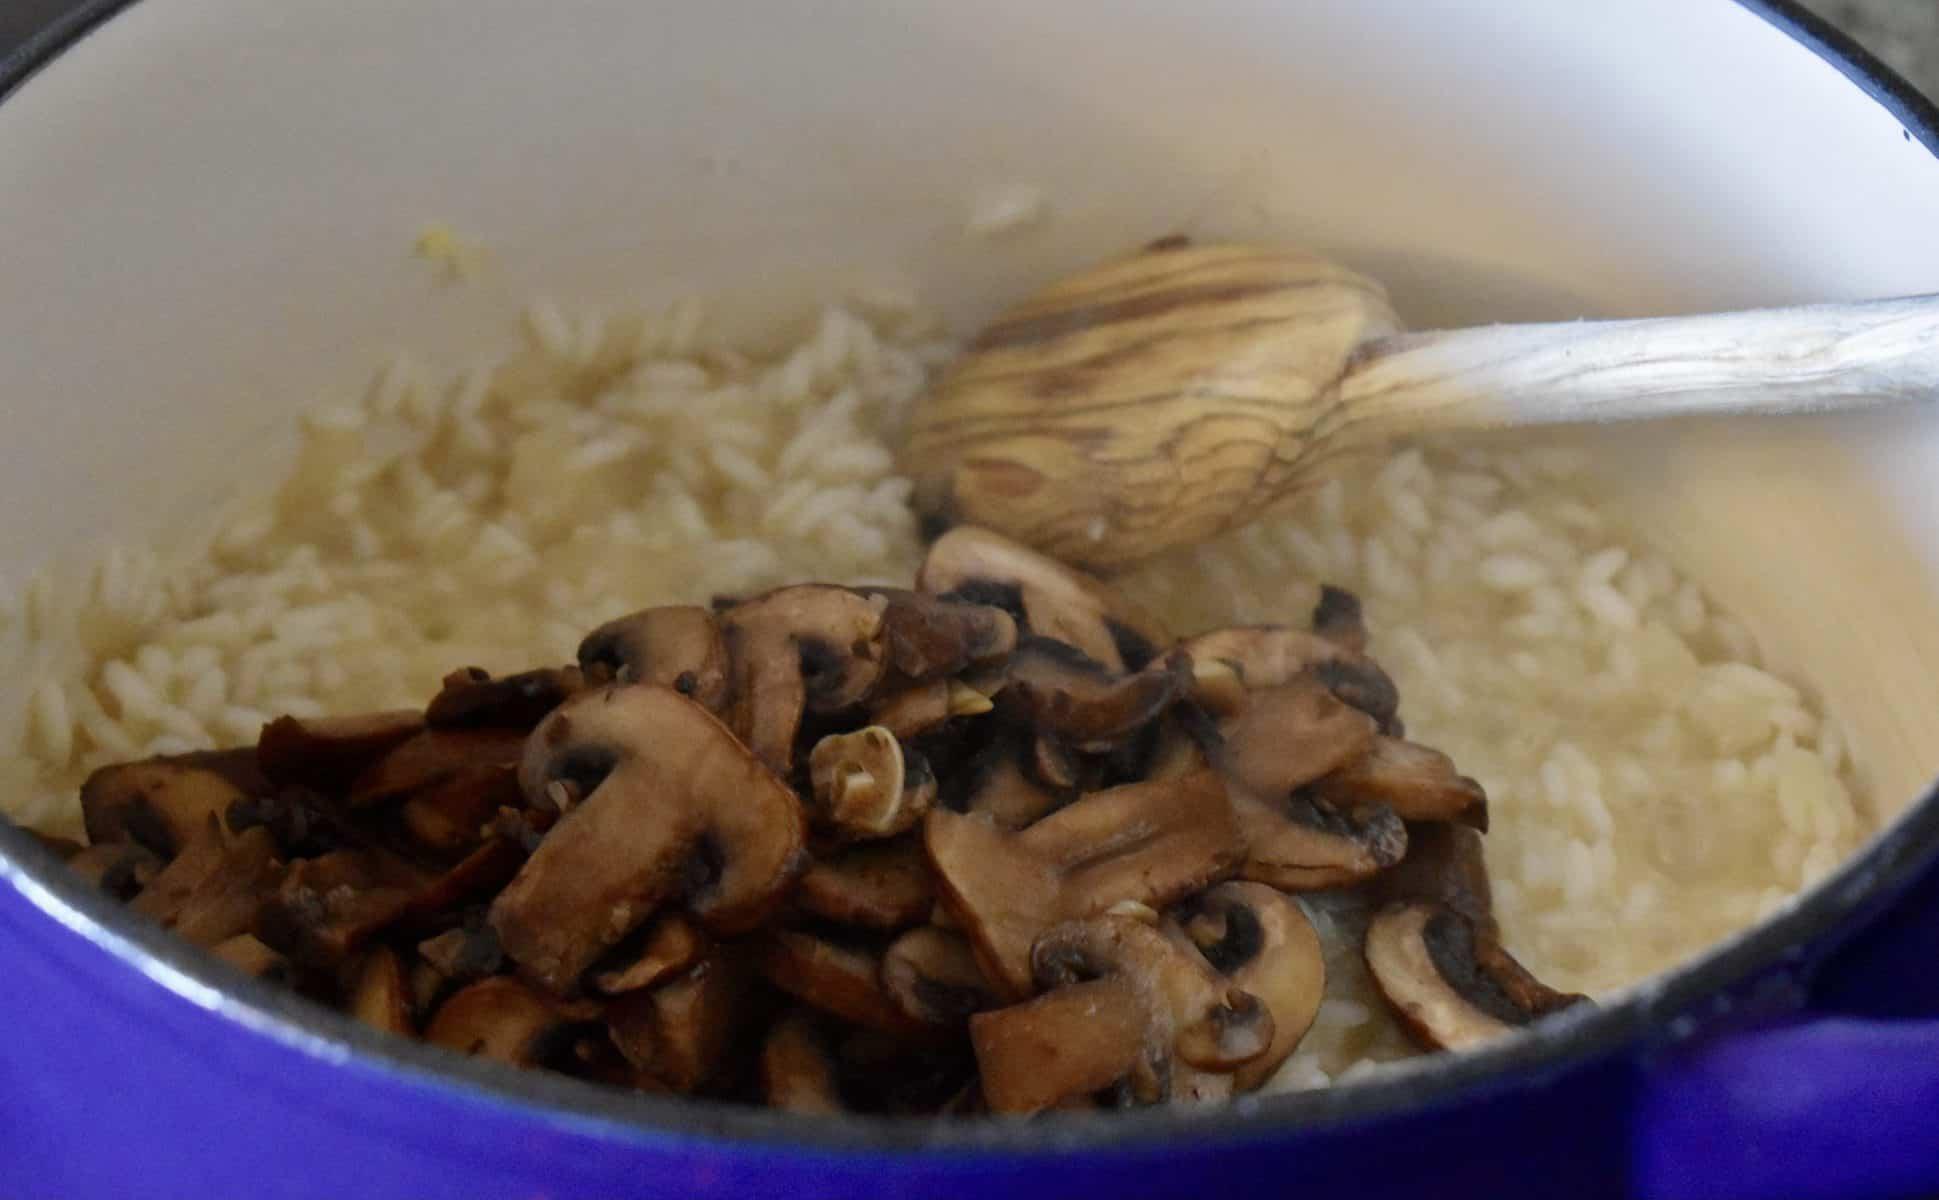 Mushrooms added to the pot of arborio rice.